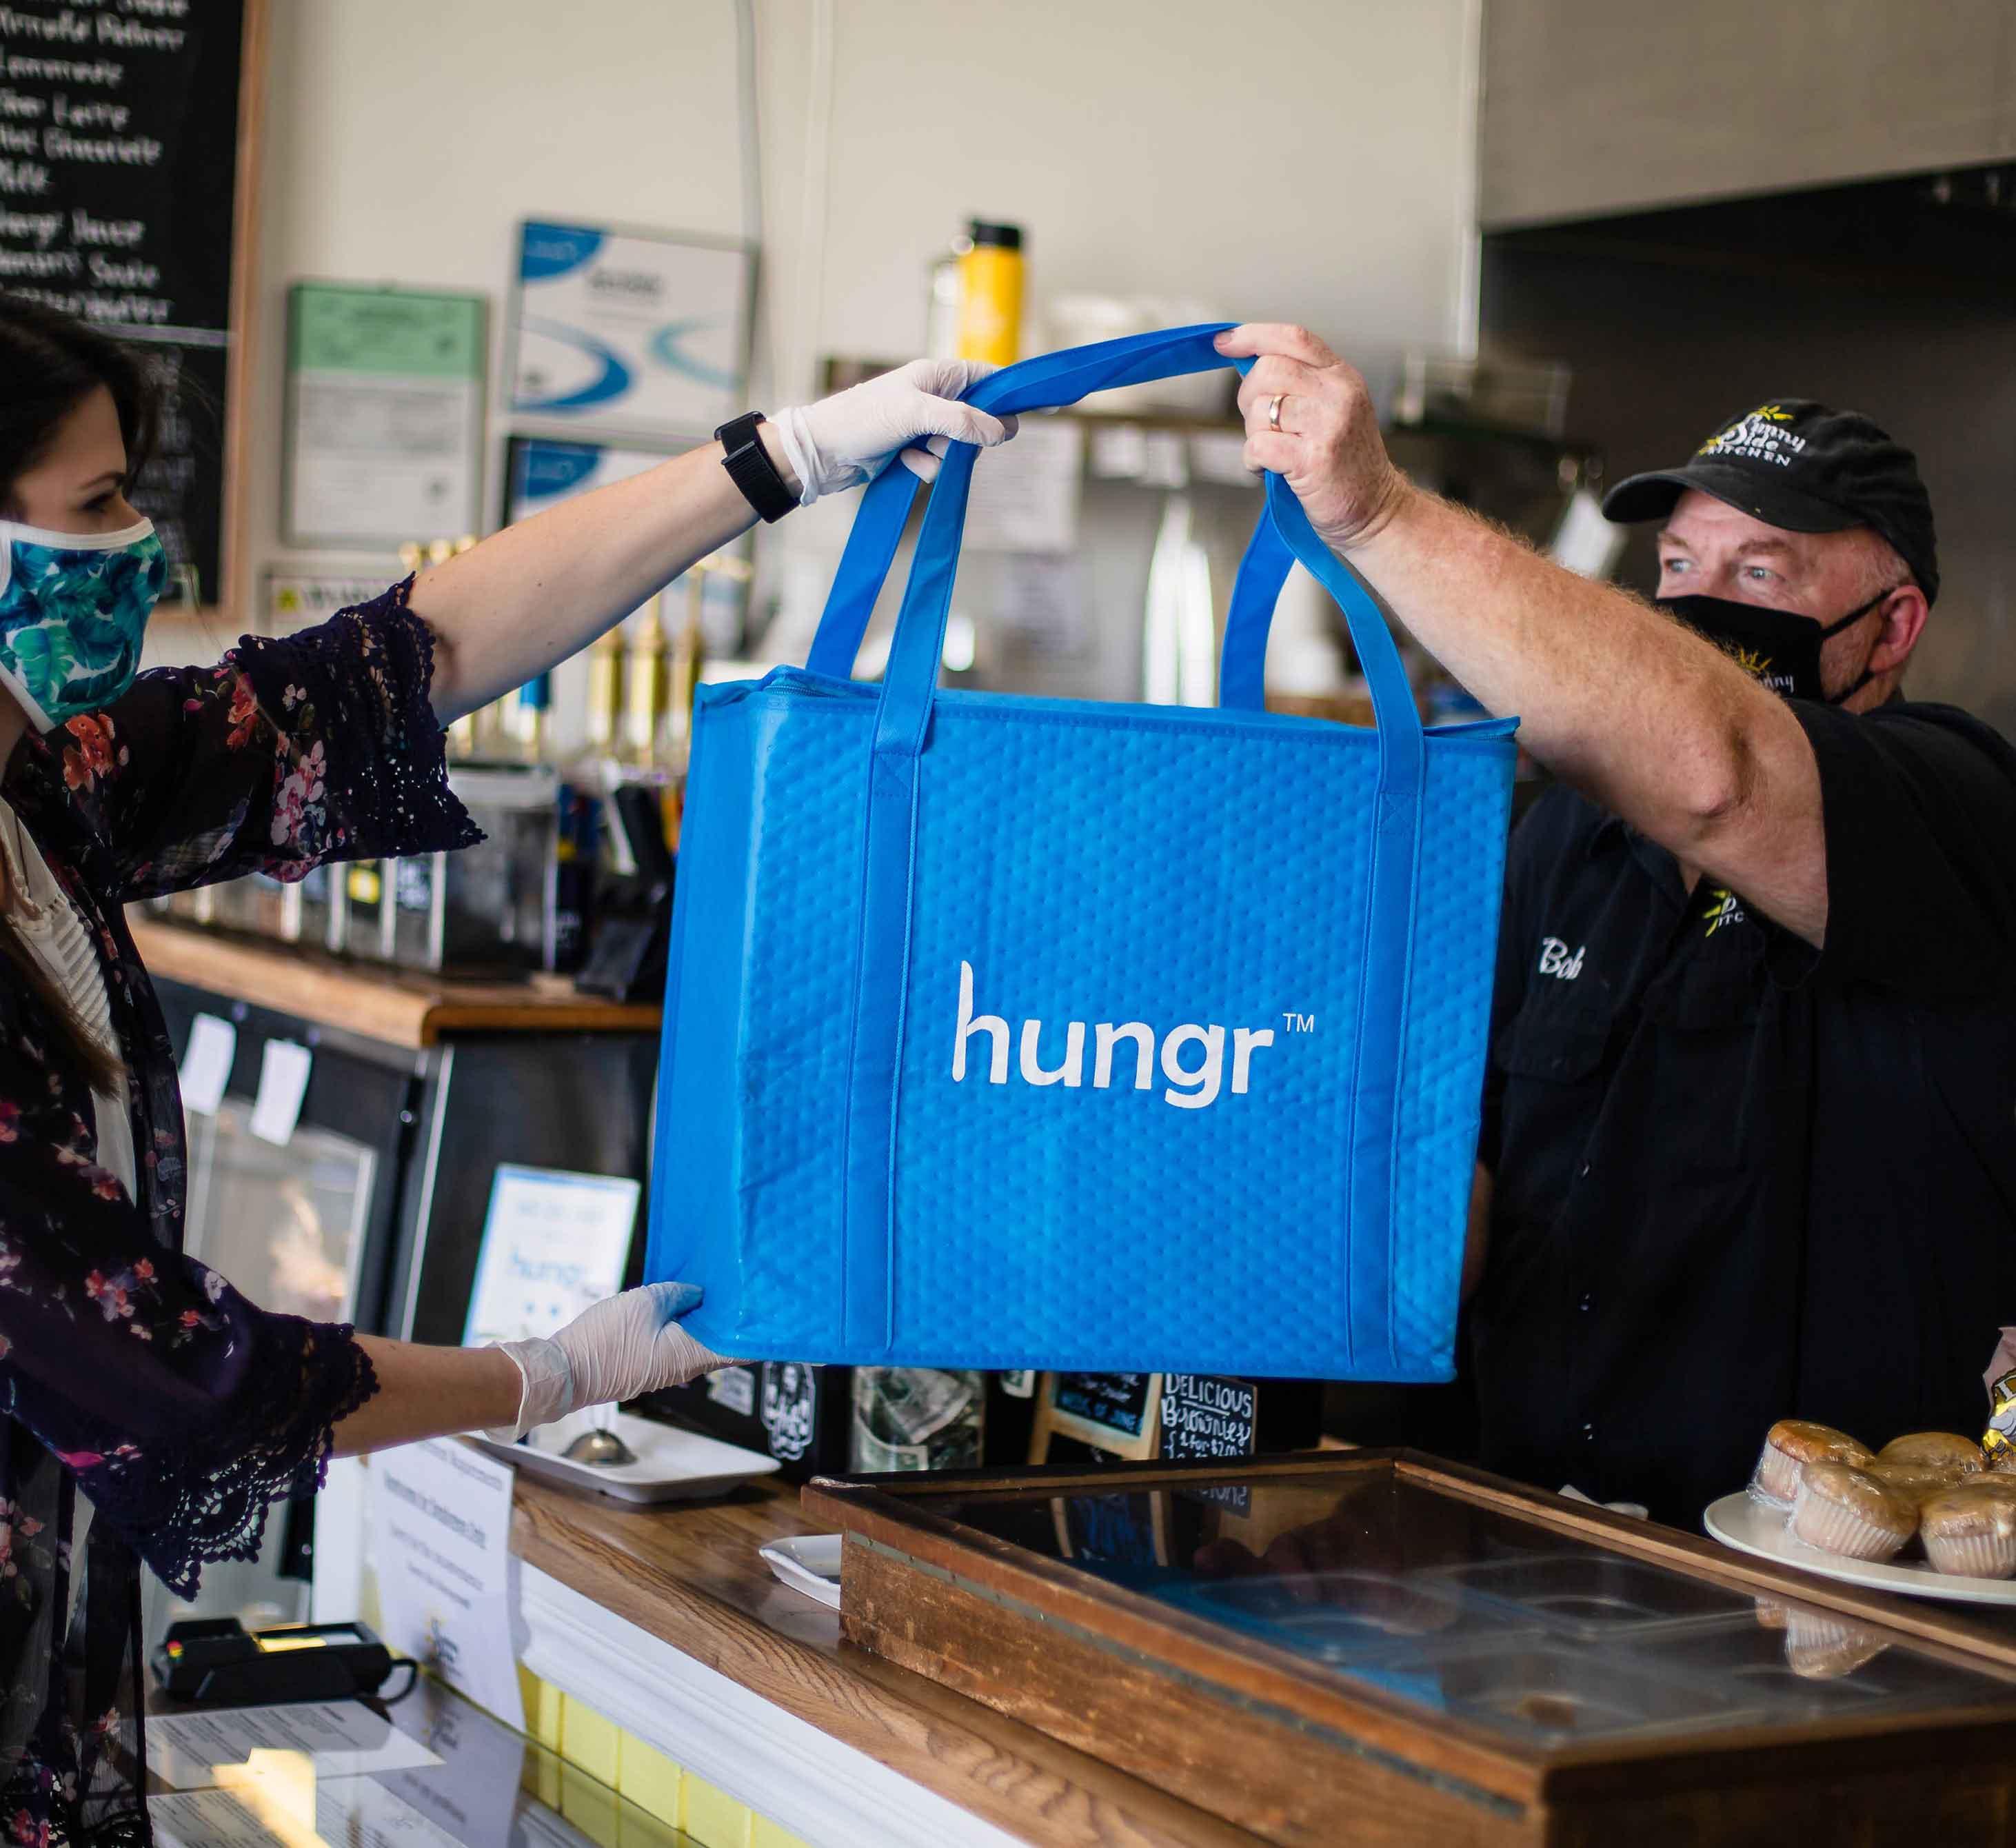 hungr bag being handed off